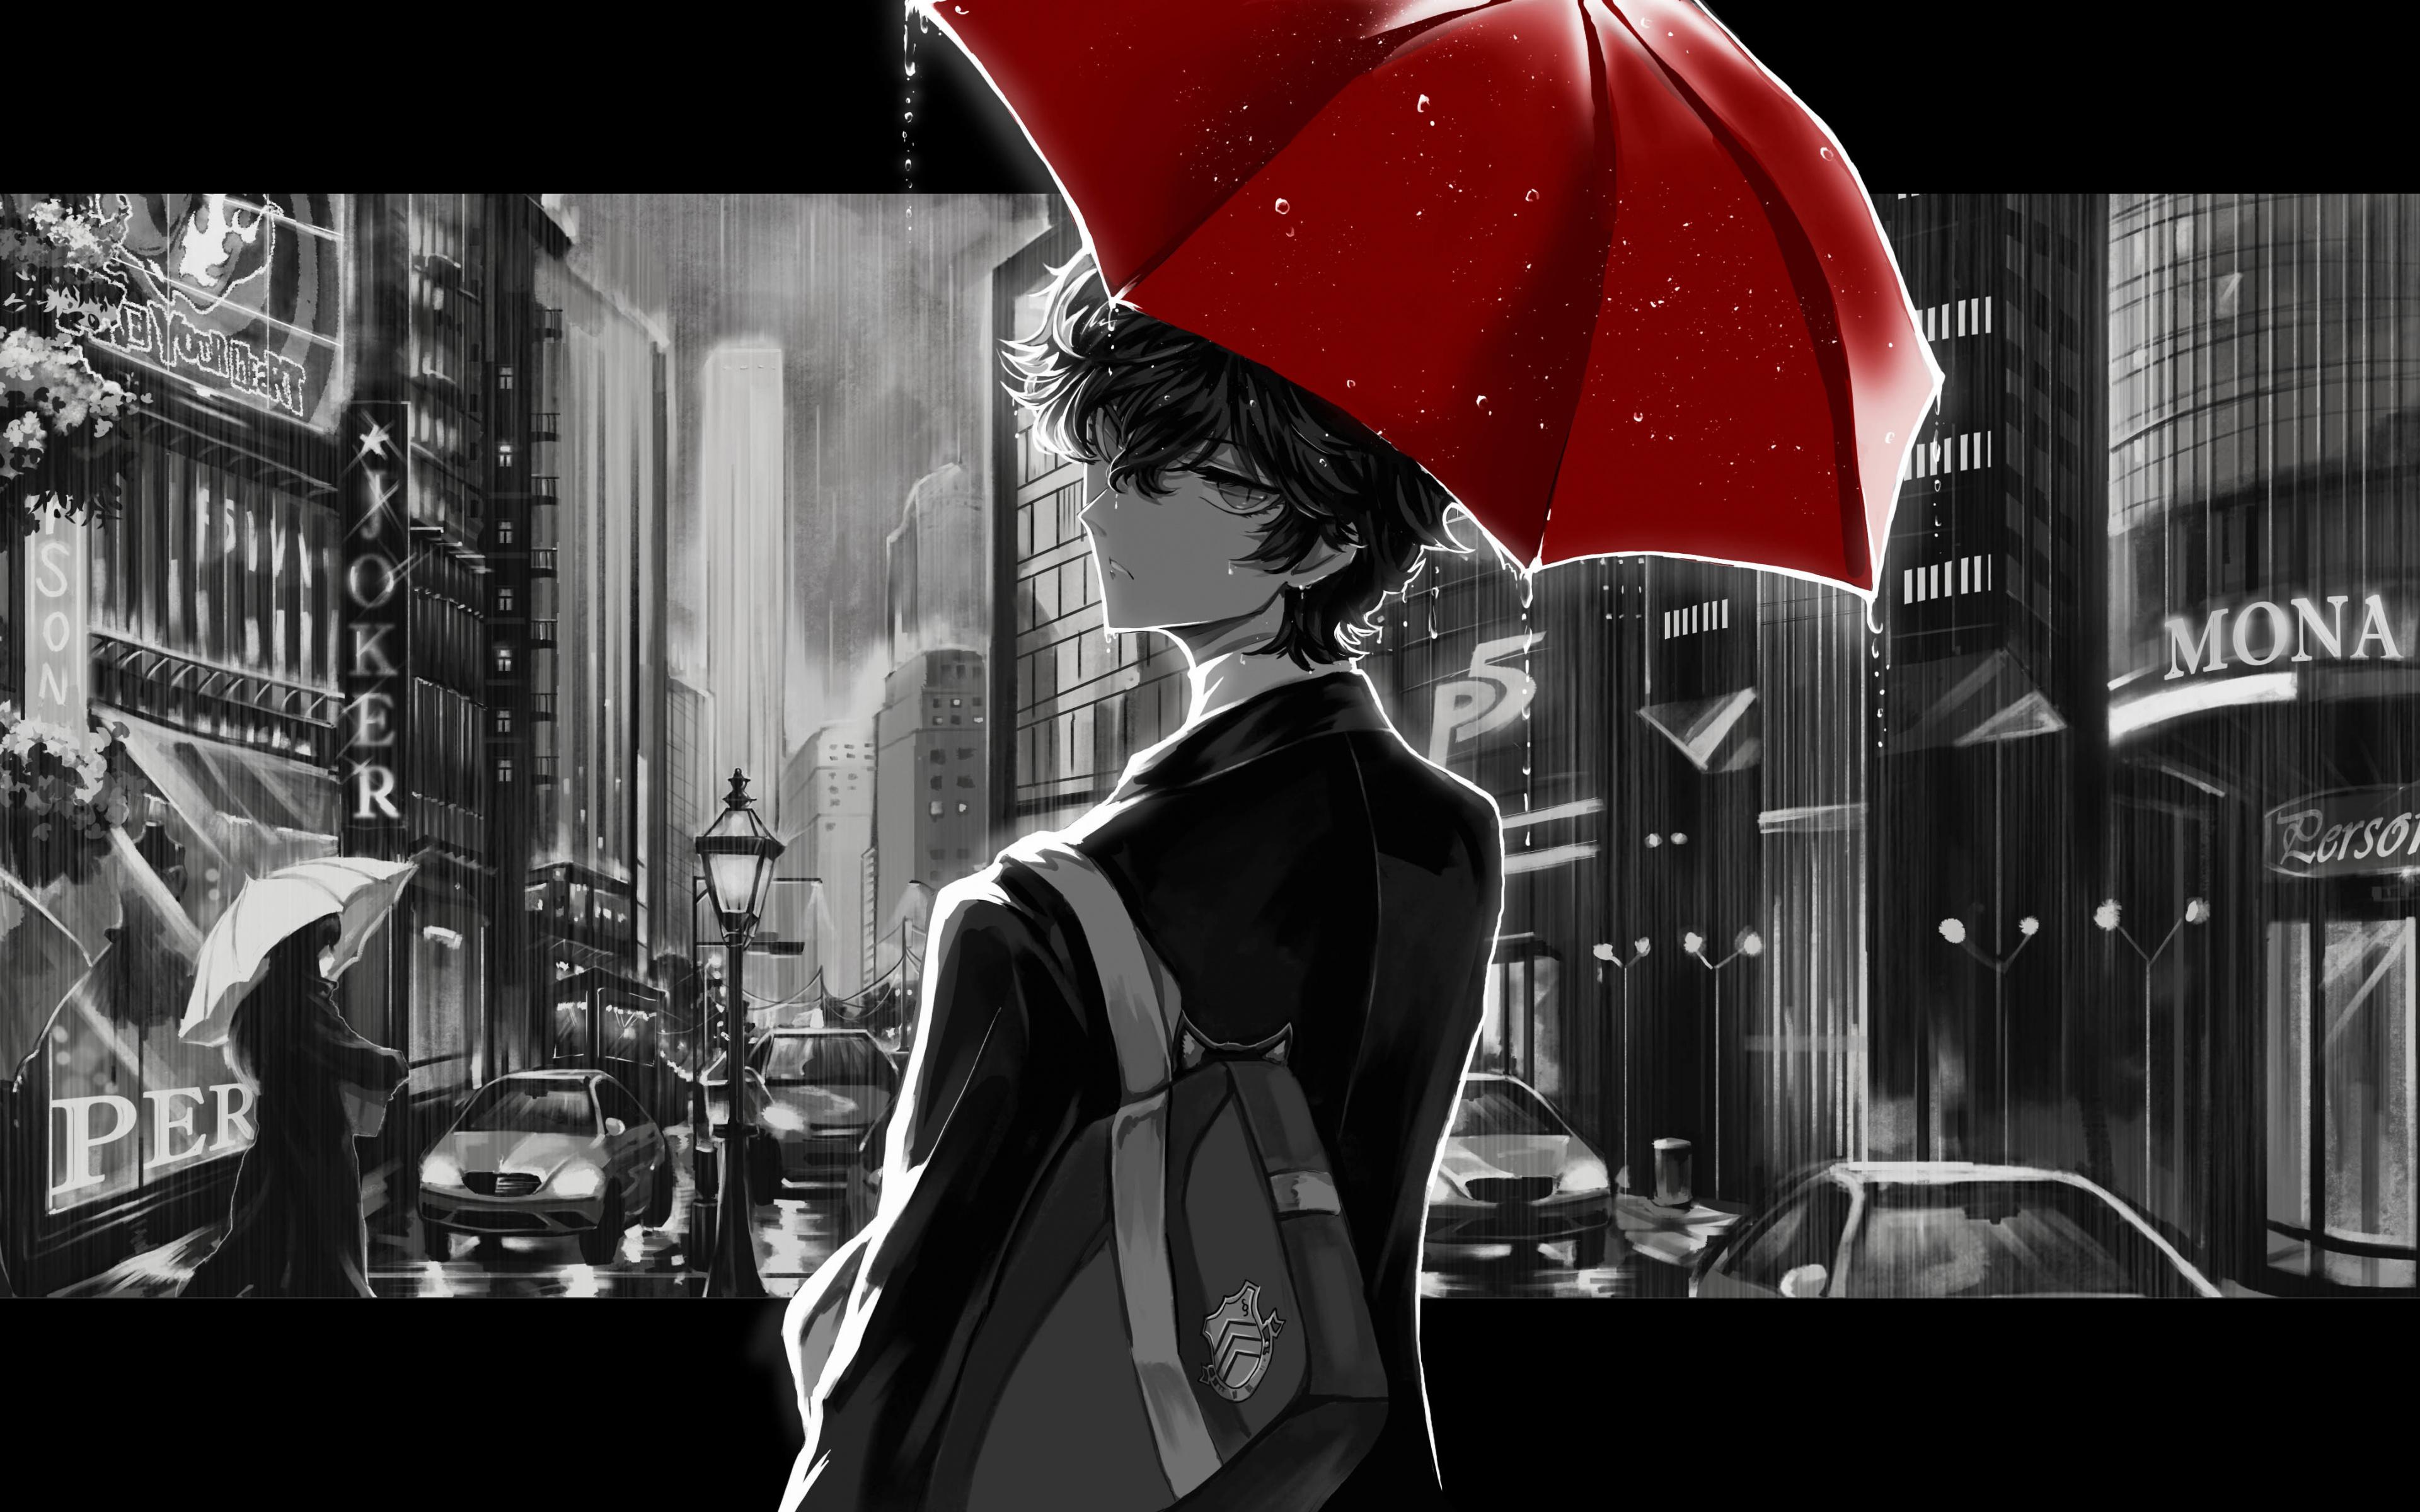 Persona 5 Wallpapers - 4K - PlayStation Universe